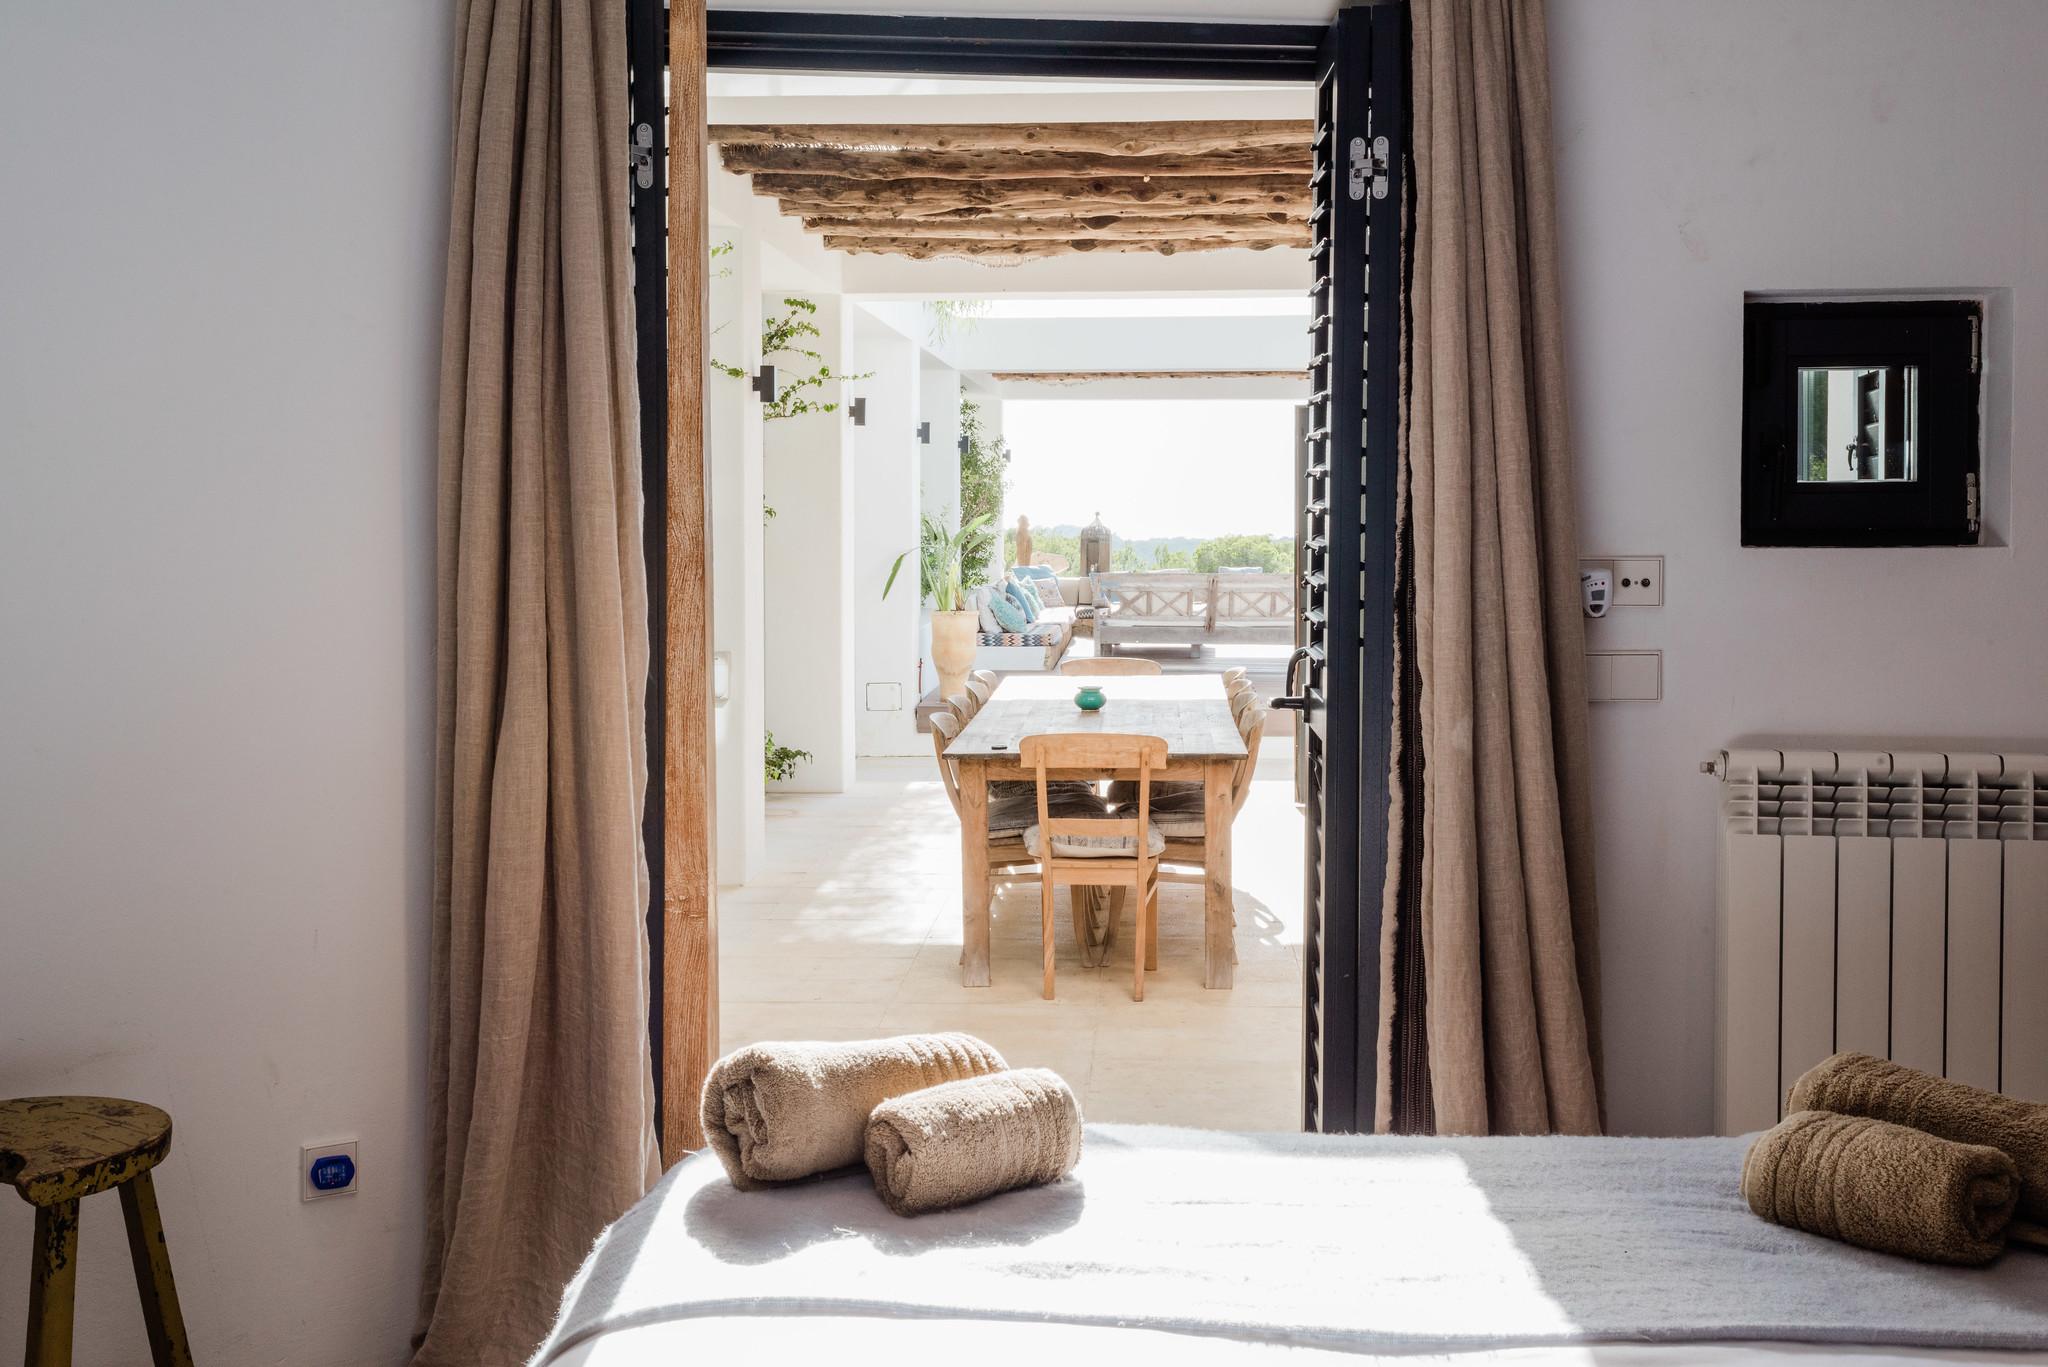 https://www.white-ibiza.com/wp-content/uploads/2020/05/white-ibiza-villas-casa-amalia-interior-bedroom2.jpg